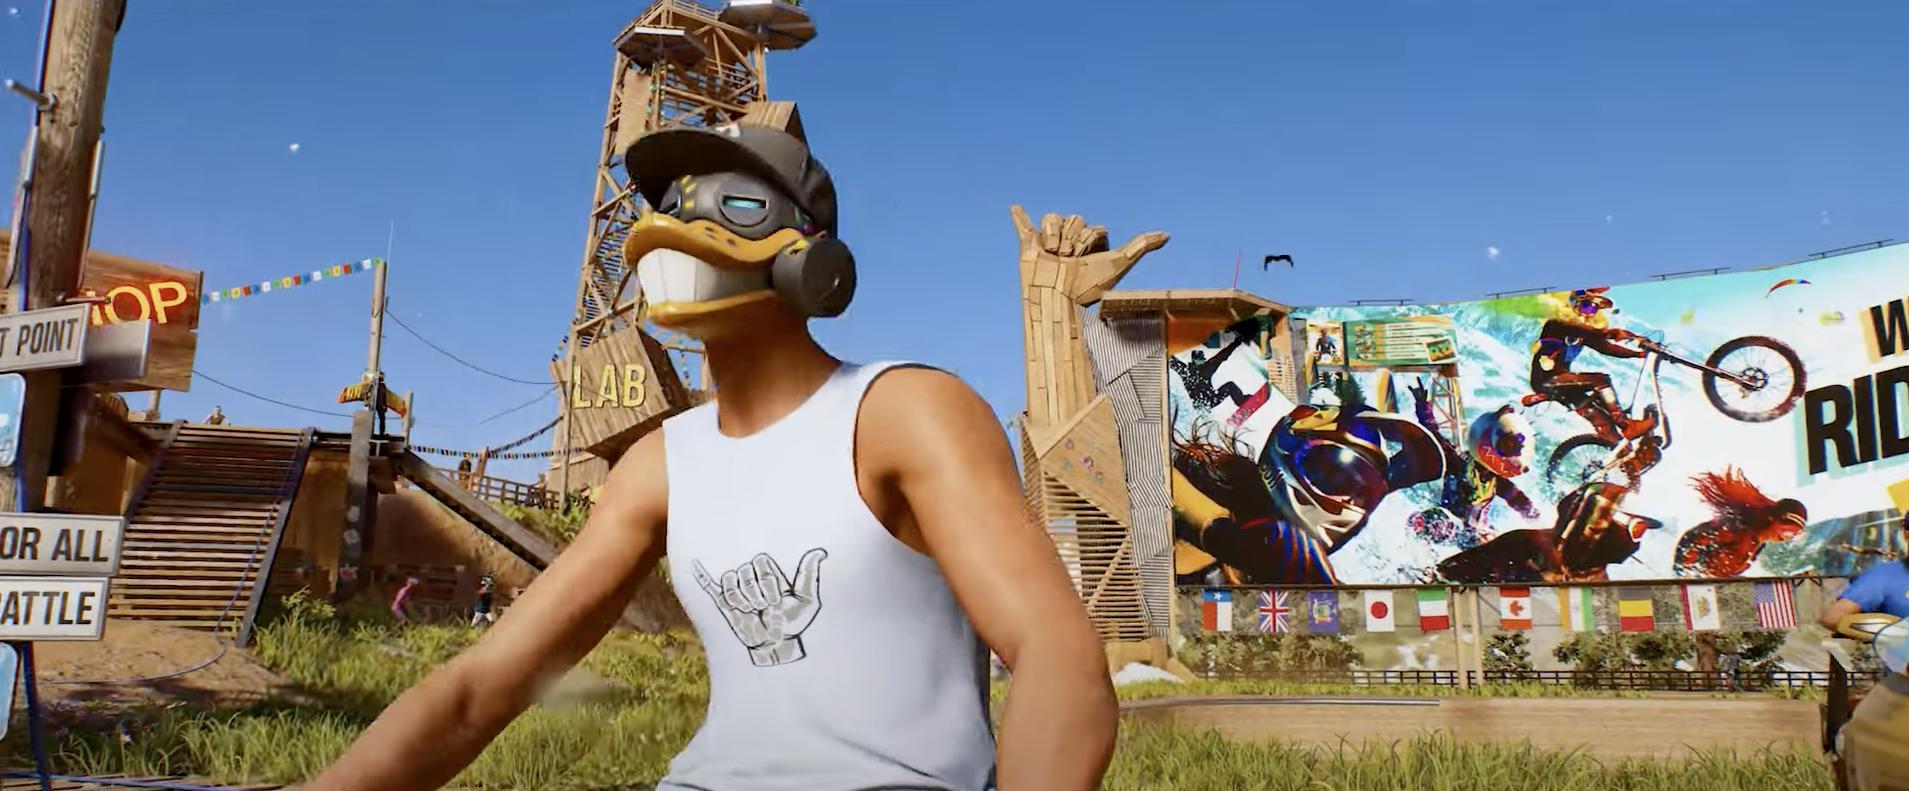 Duck mask man